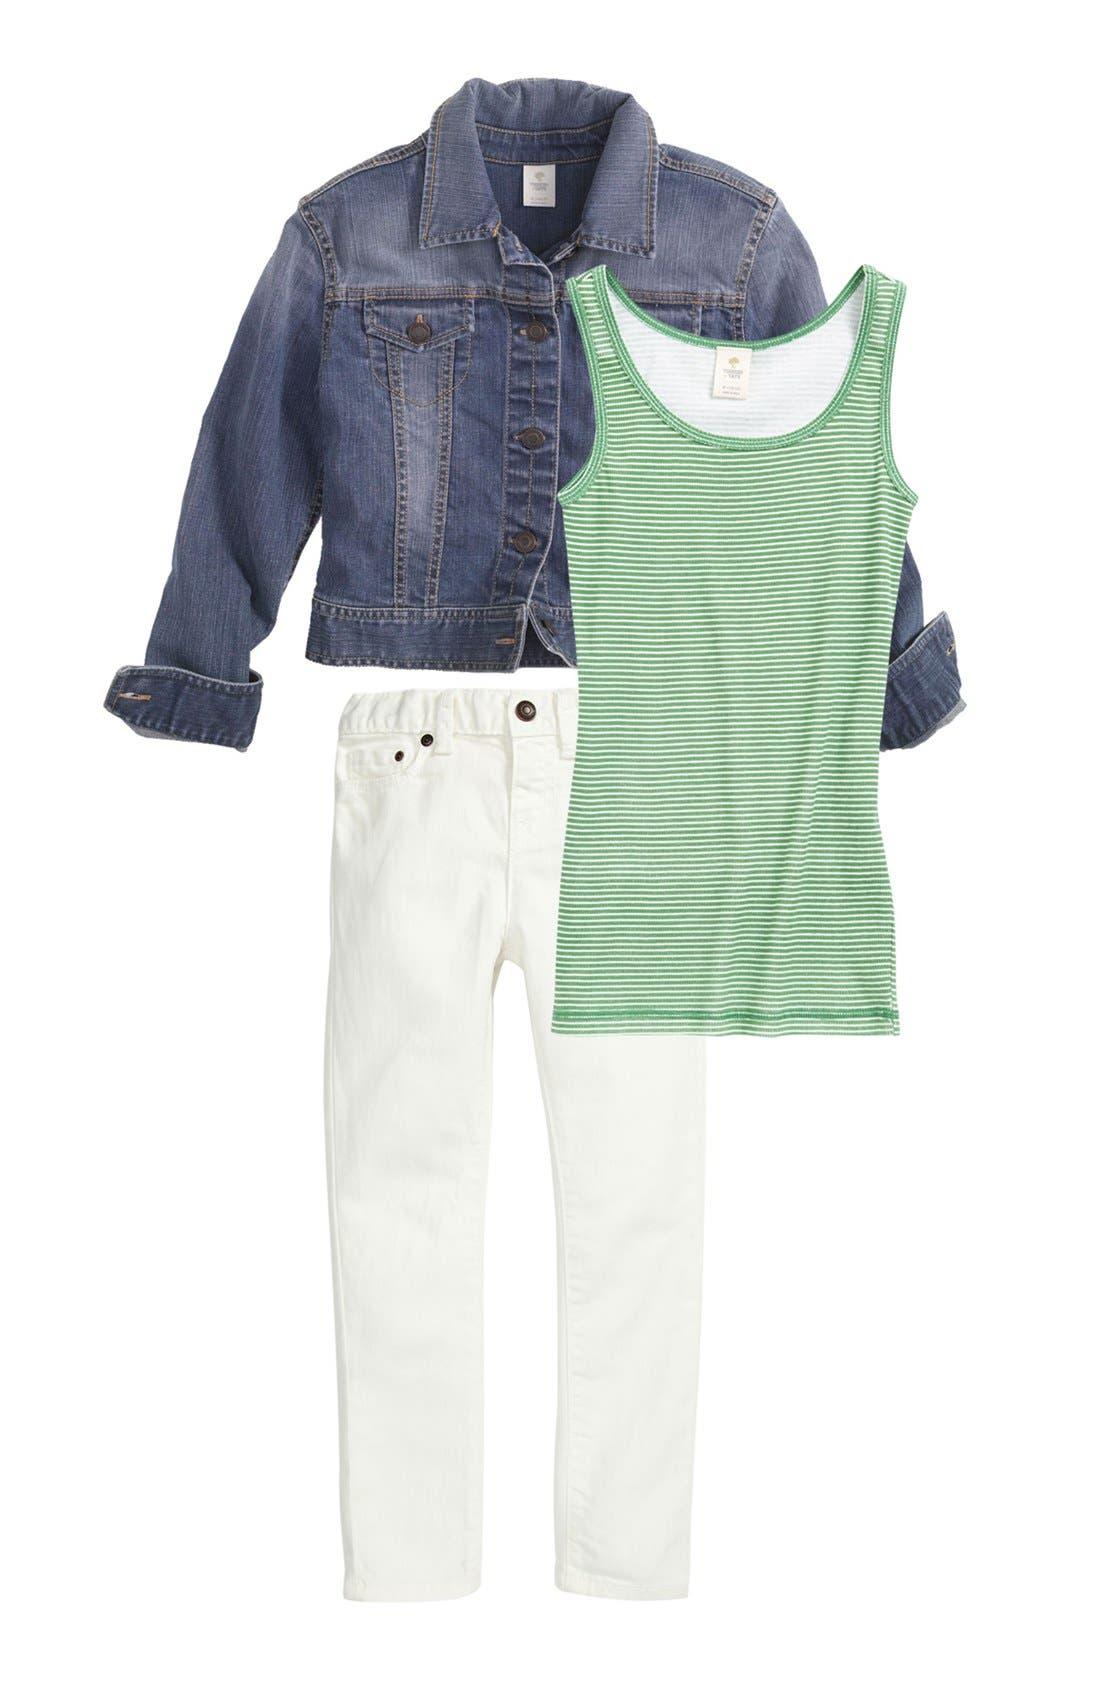 Alternate Image 1 Selected - Tucker + Tate Tank Top, Jacket & Skinny Jeans (Big Girls)